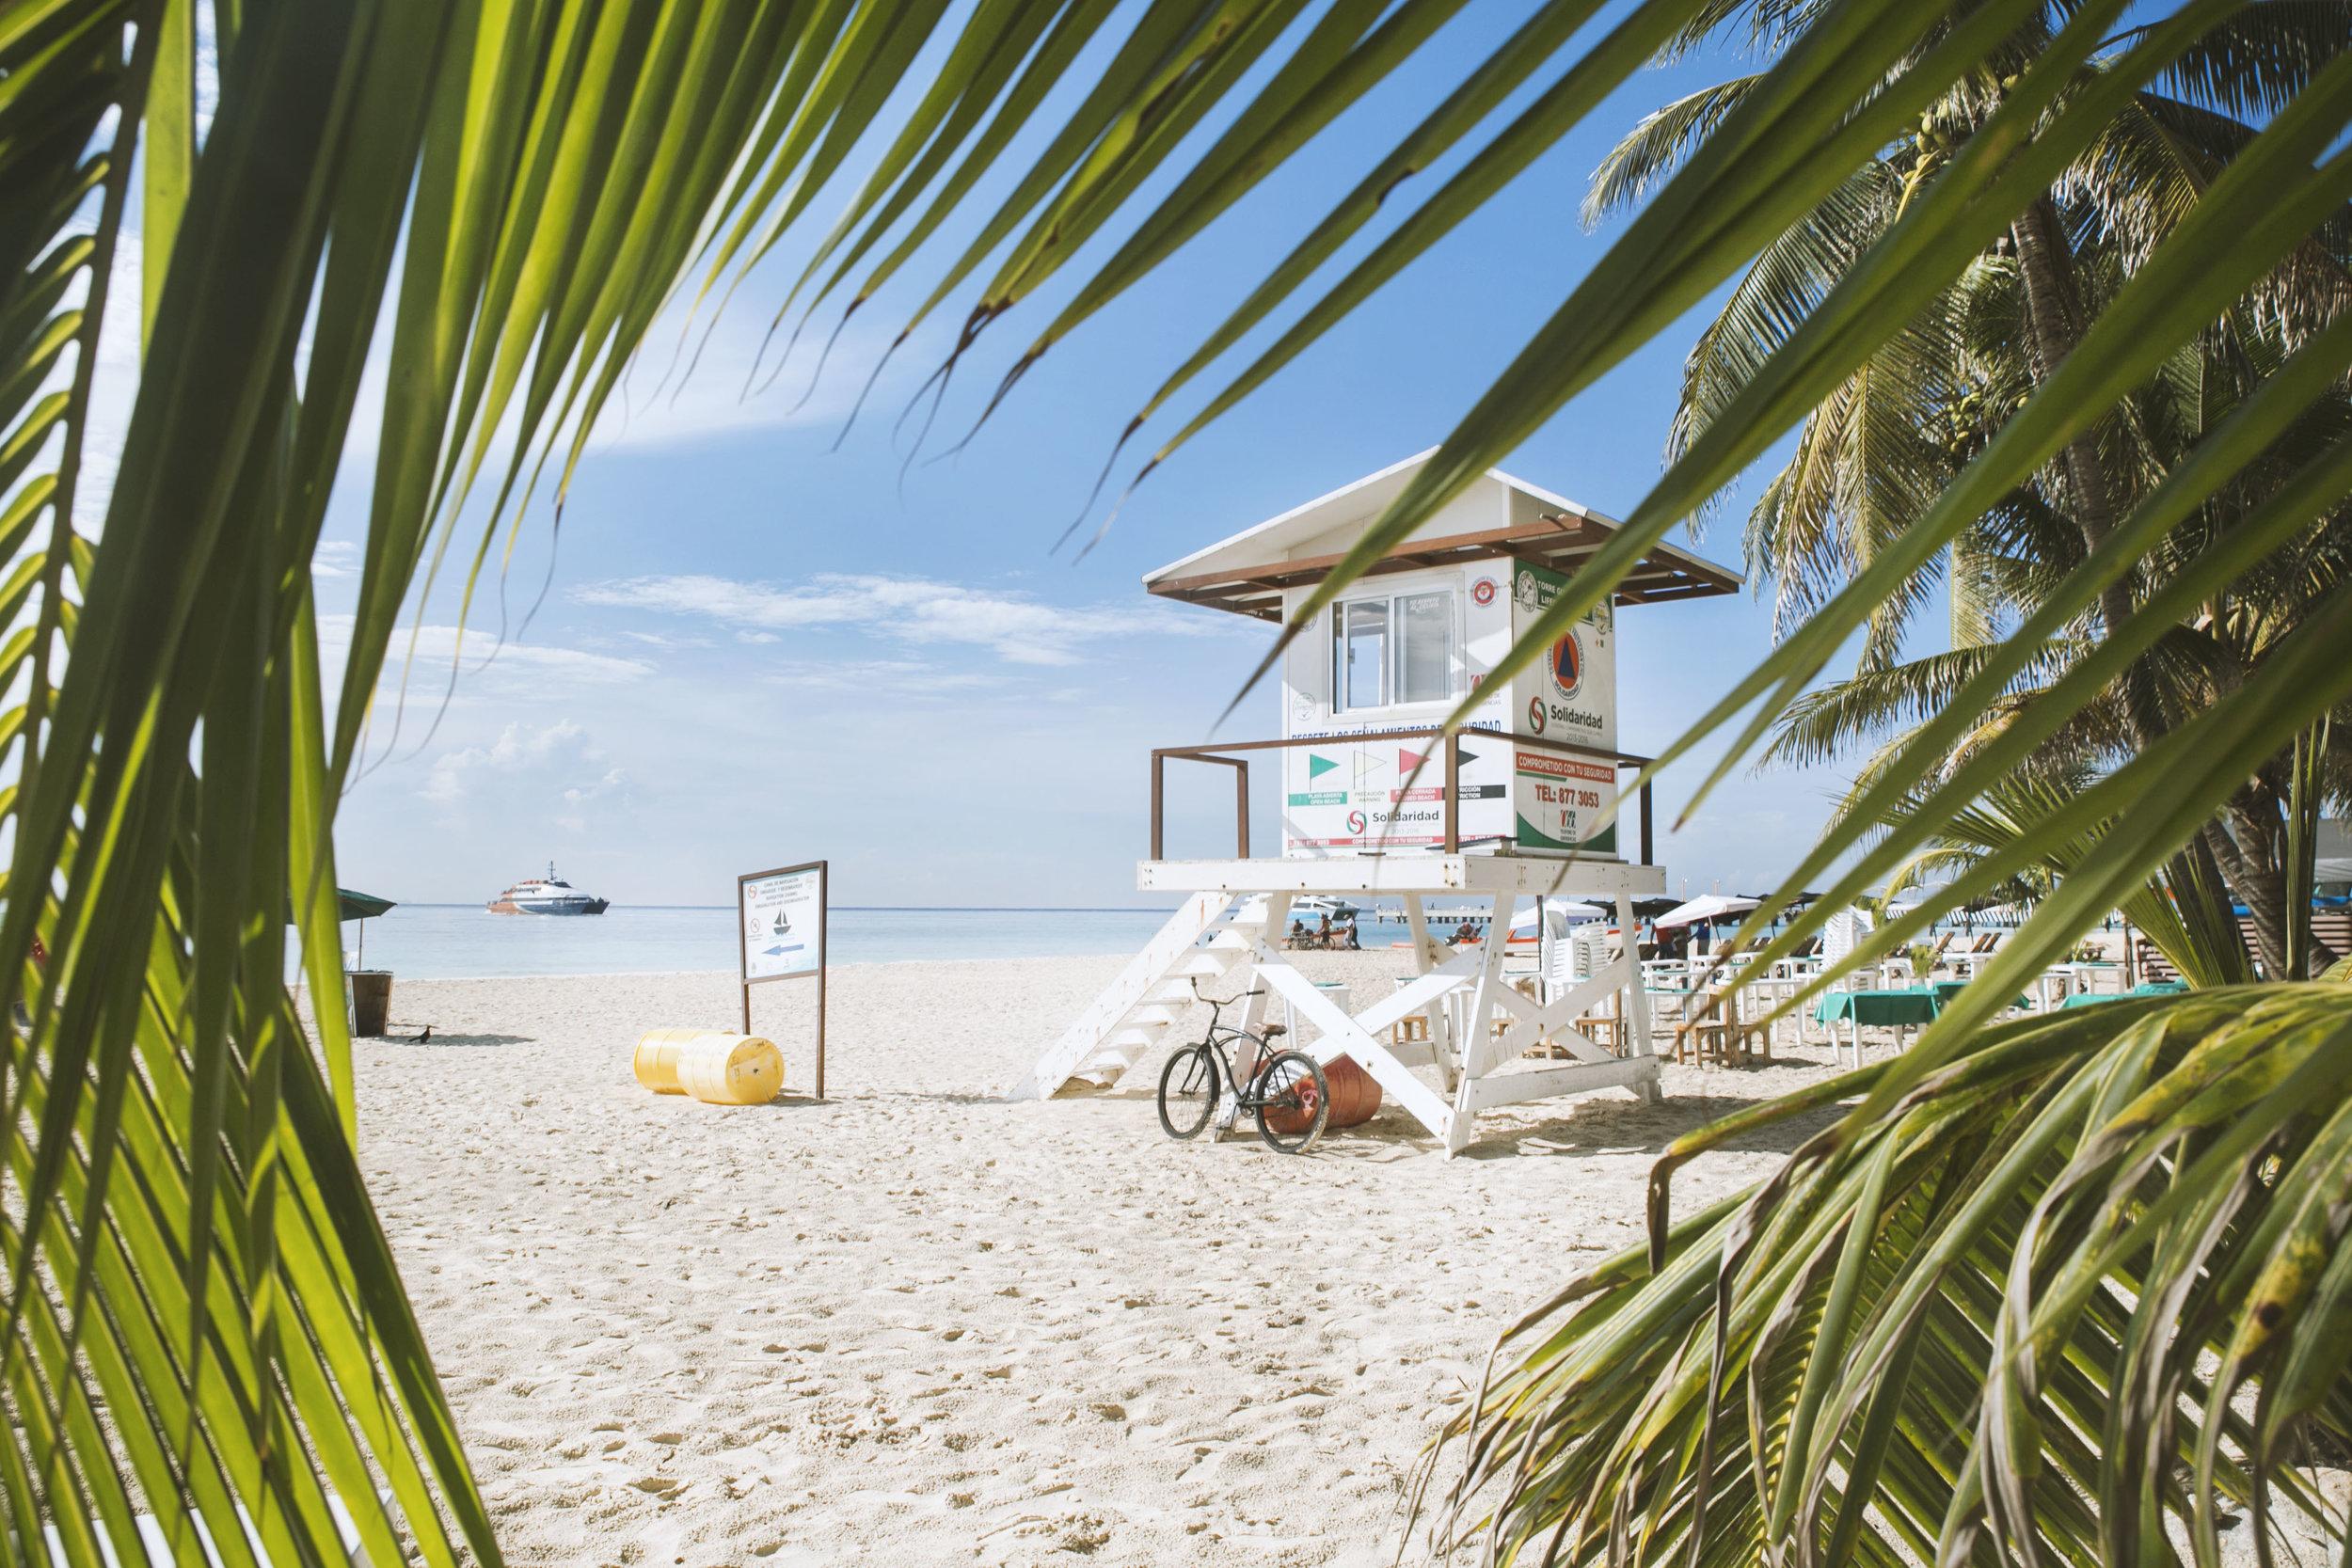 Playa del Carmen, Yucatán.